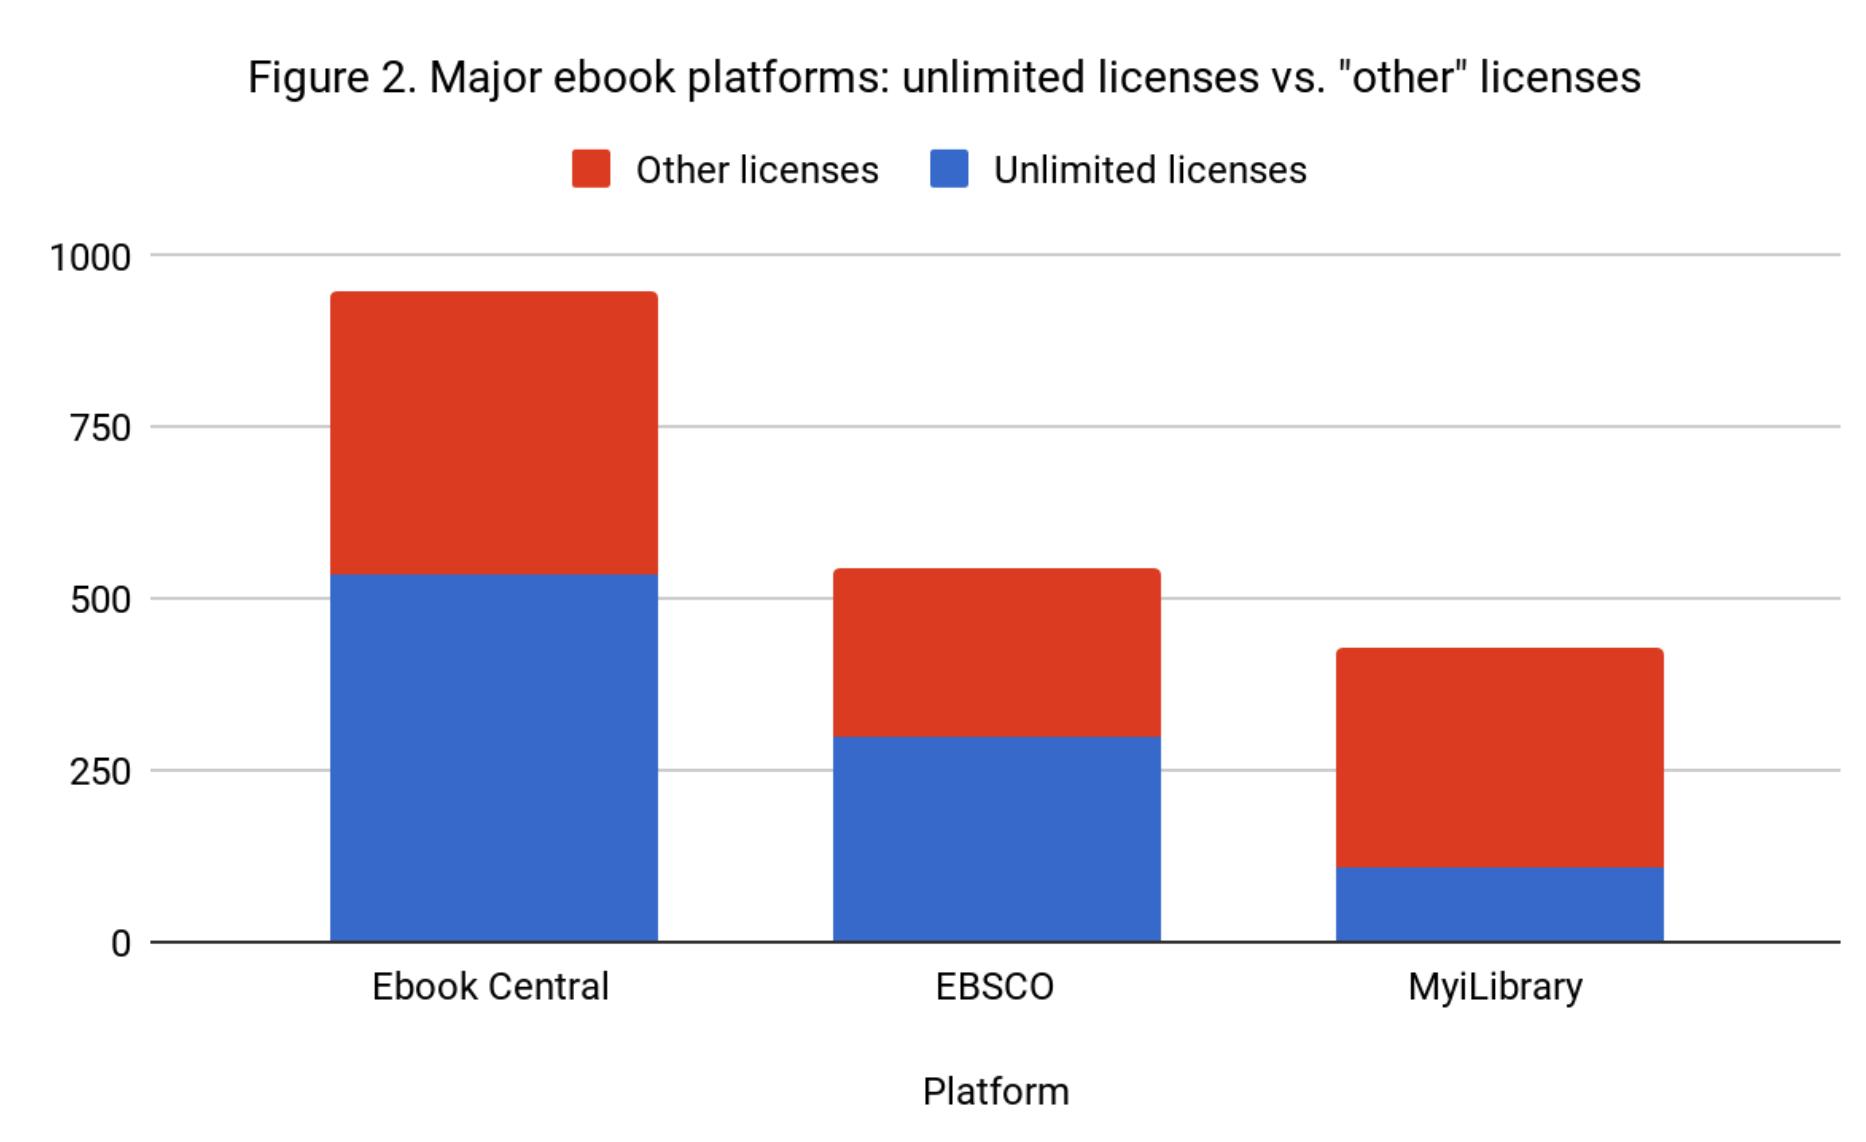 Major ebook platform graphs